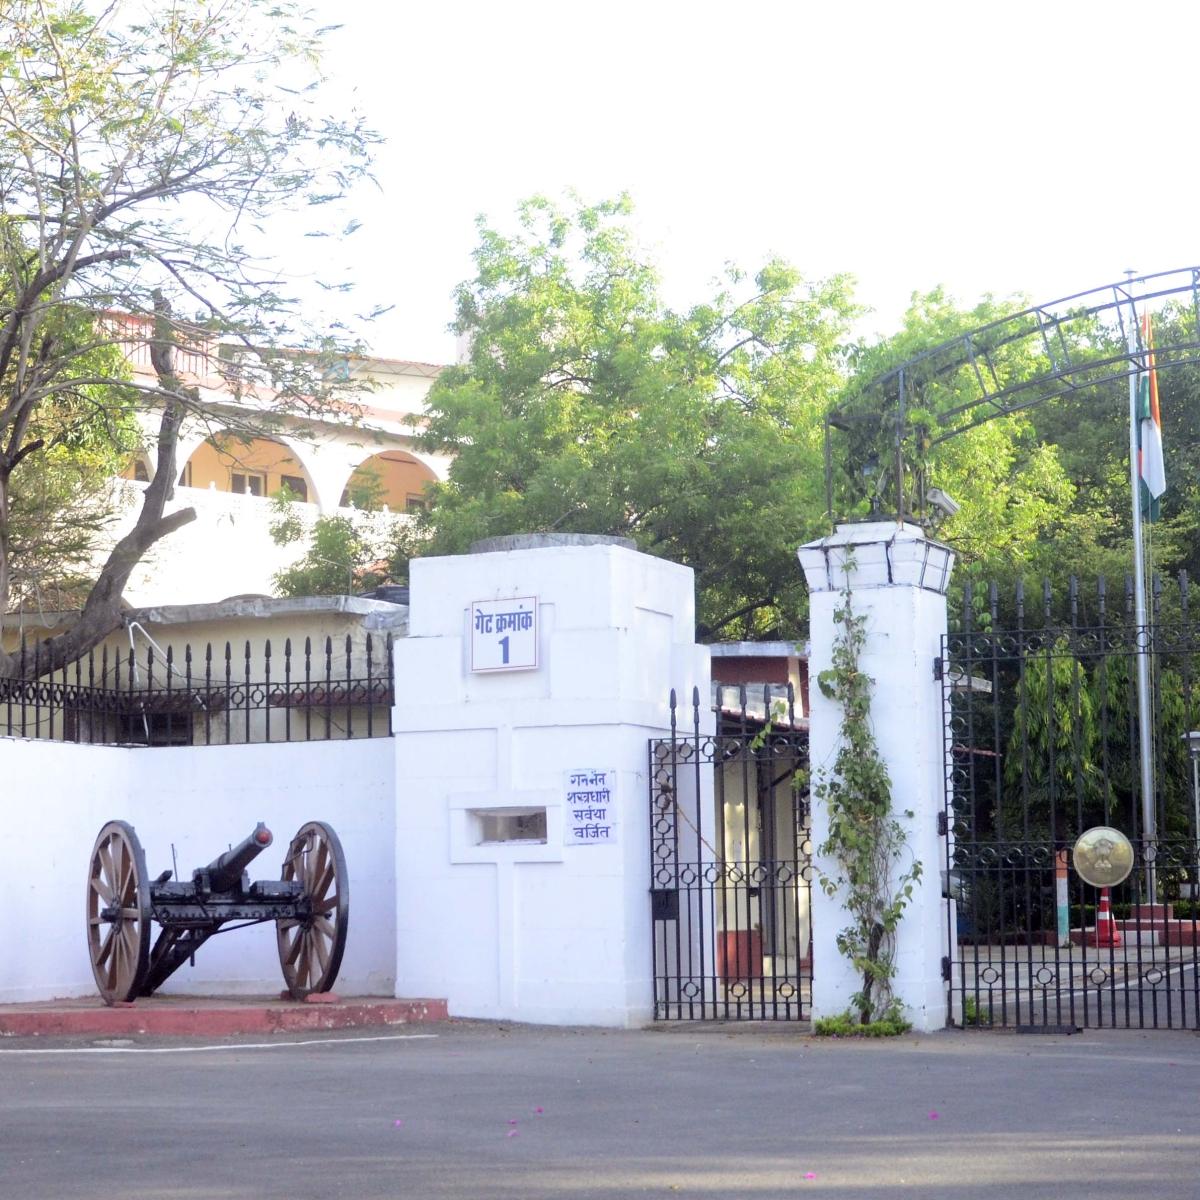 Bhopal: Corona infects 16 jawans in three days at Raj Bhavan